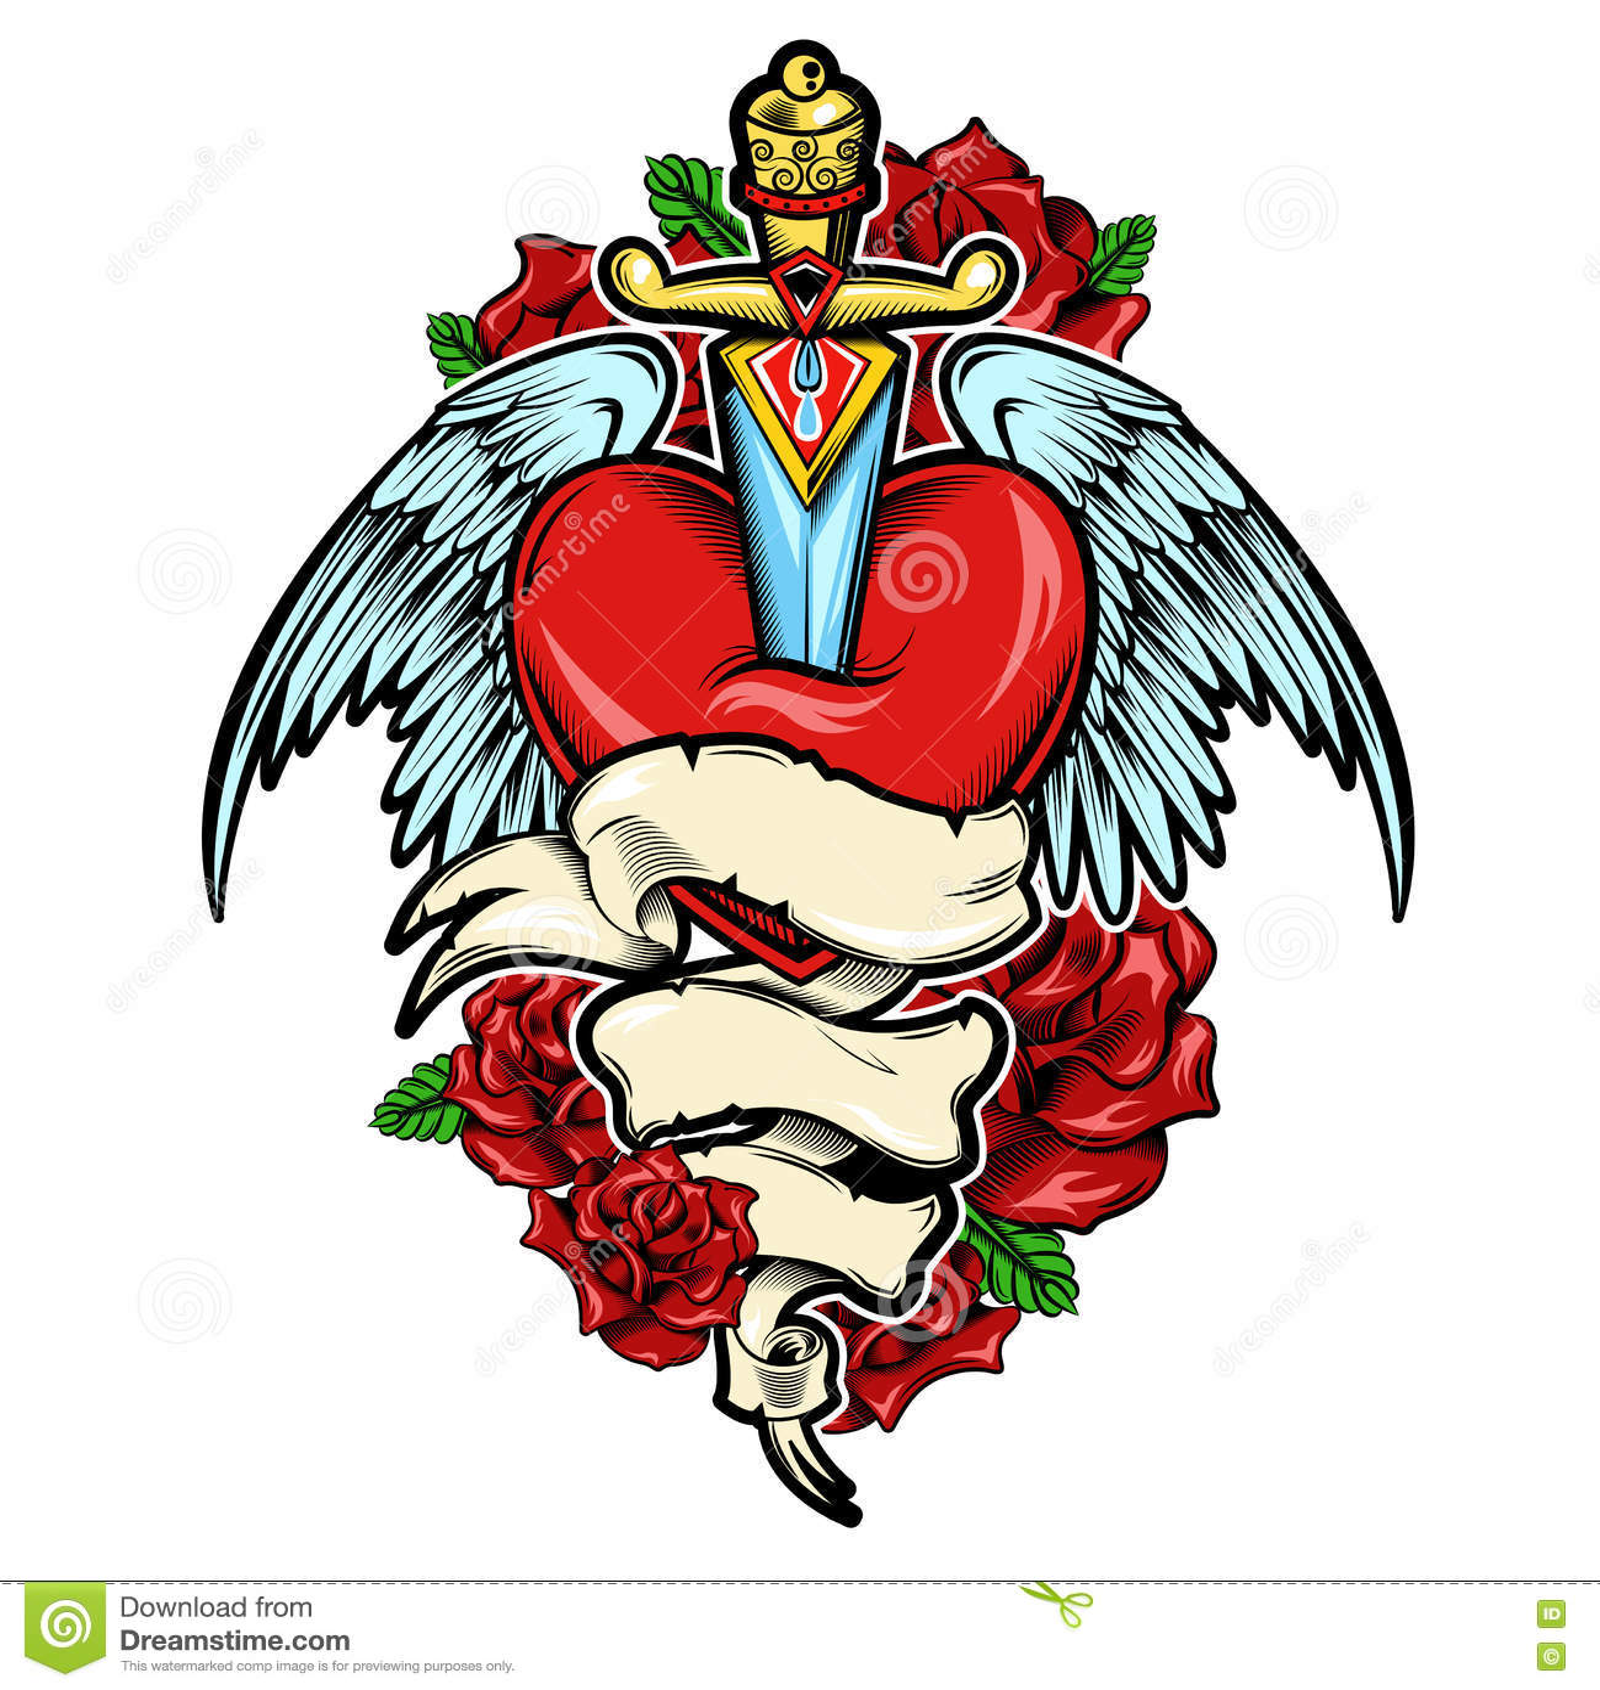 Broken Heart Tattoo Design Stock Vector Illustration Of Layout